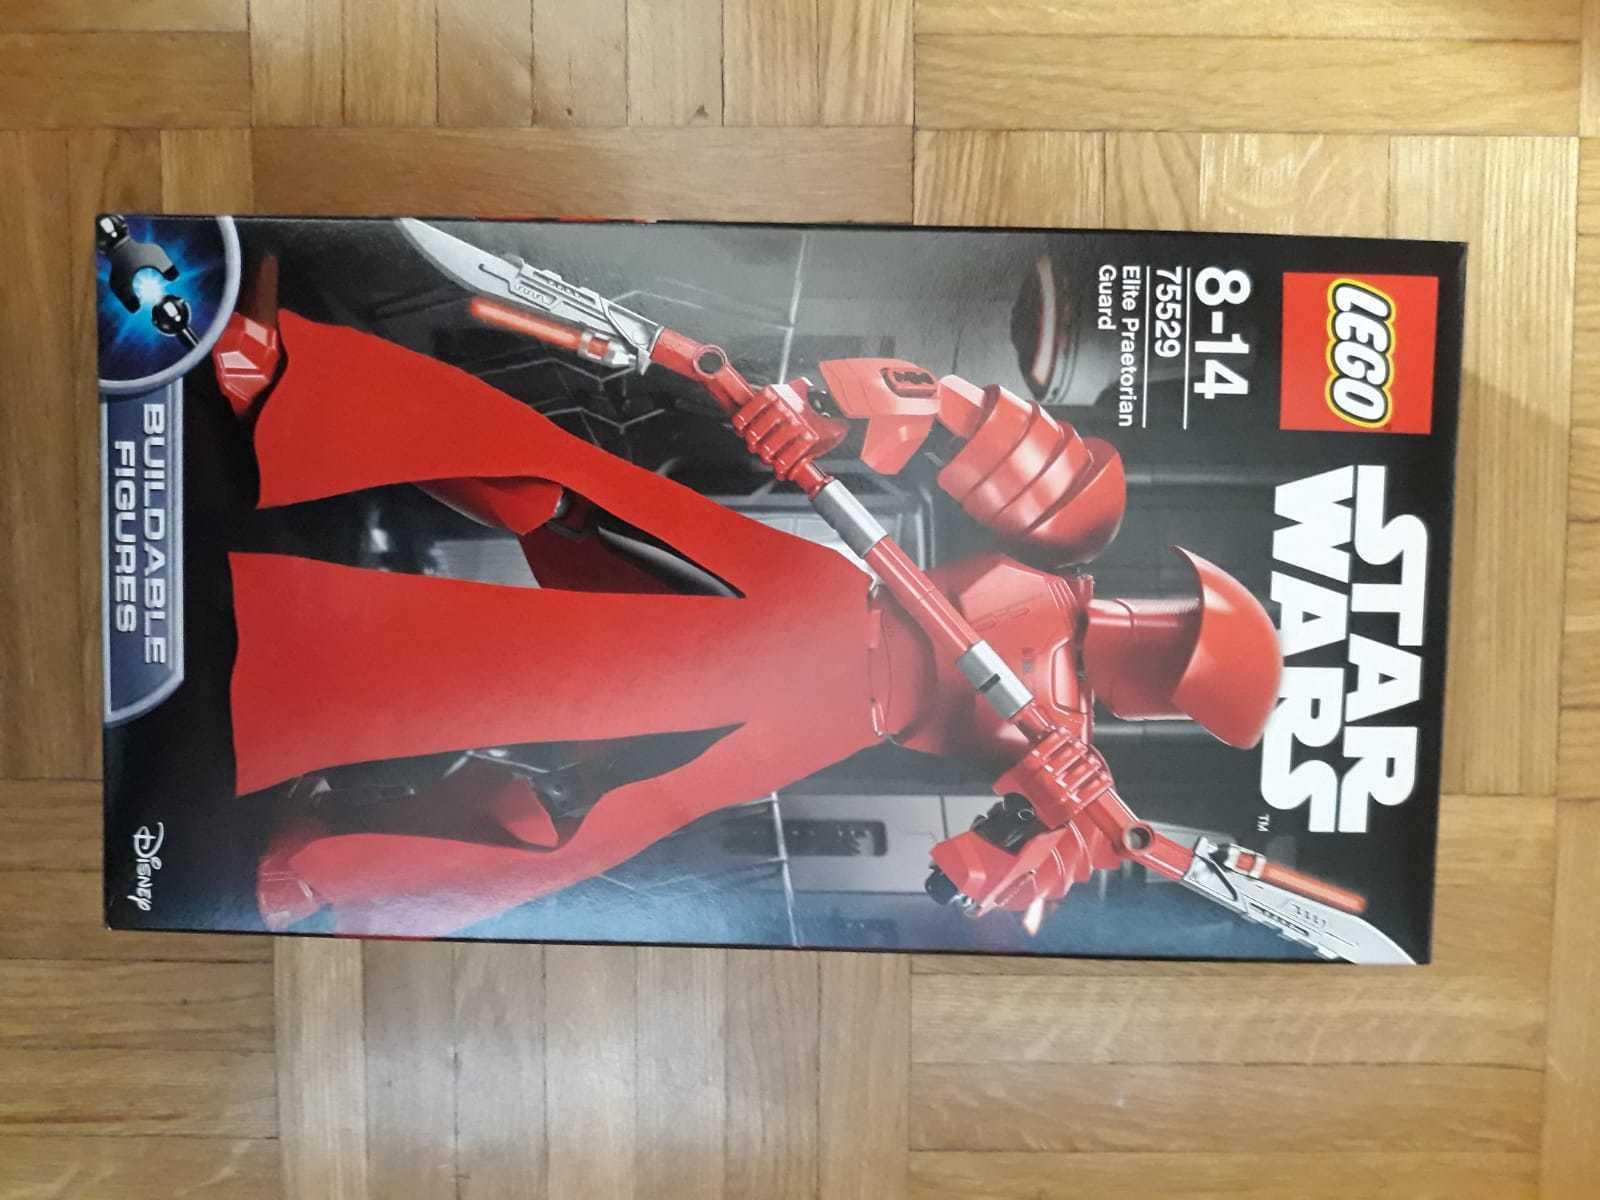 LEGO Buildable cifras Planet Series 9674 9675 9676 9677  9678 9679 75006 75007  più ordine